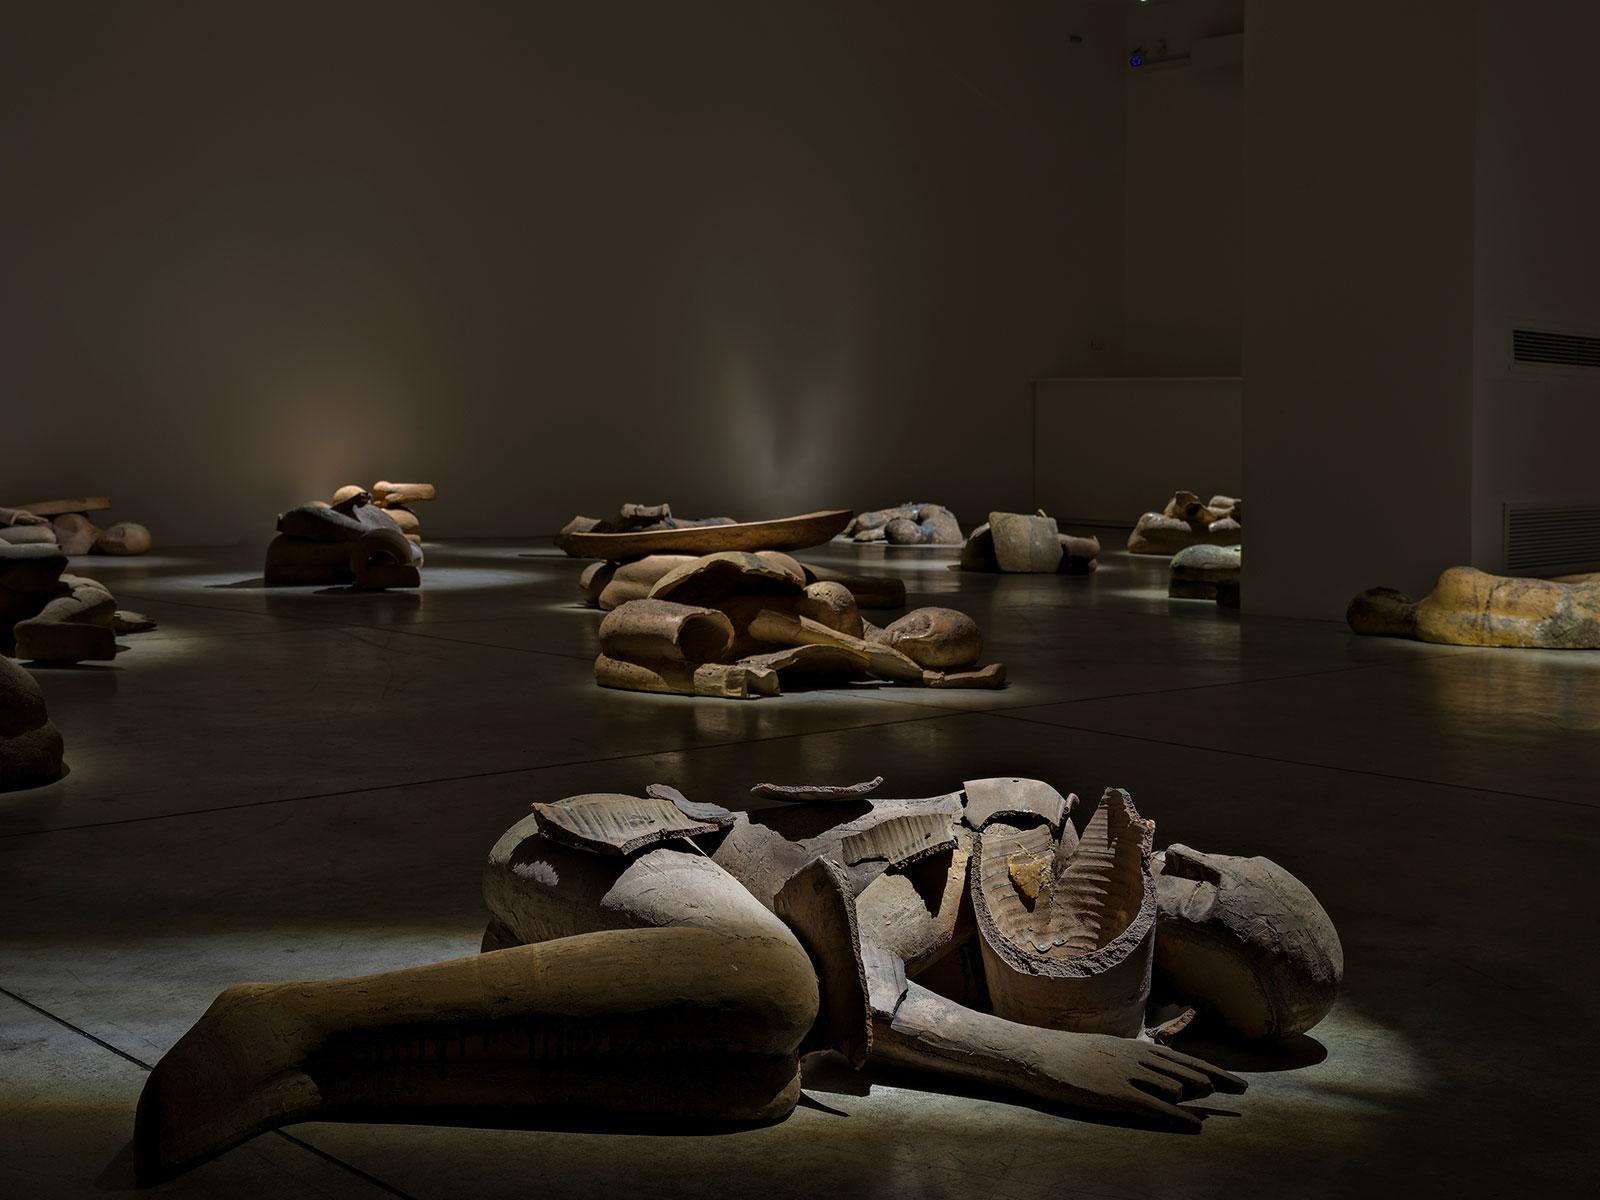 Mimmo Paladino, Installation view © 2021 Cardi Gallery, Photo Carlo Vannini